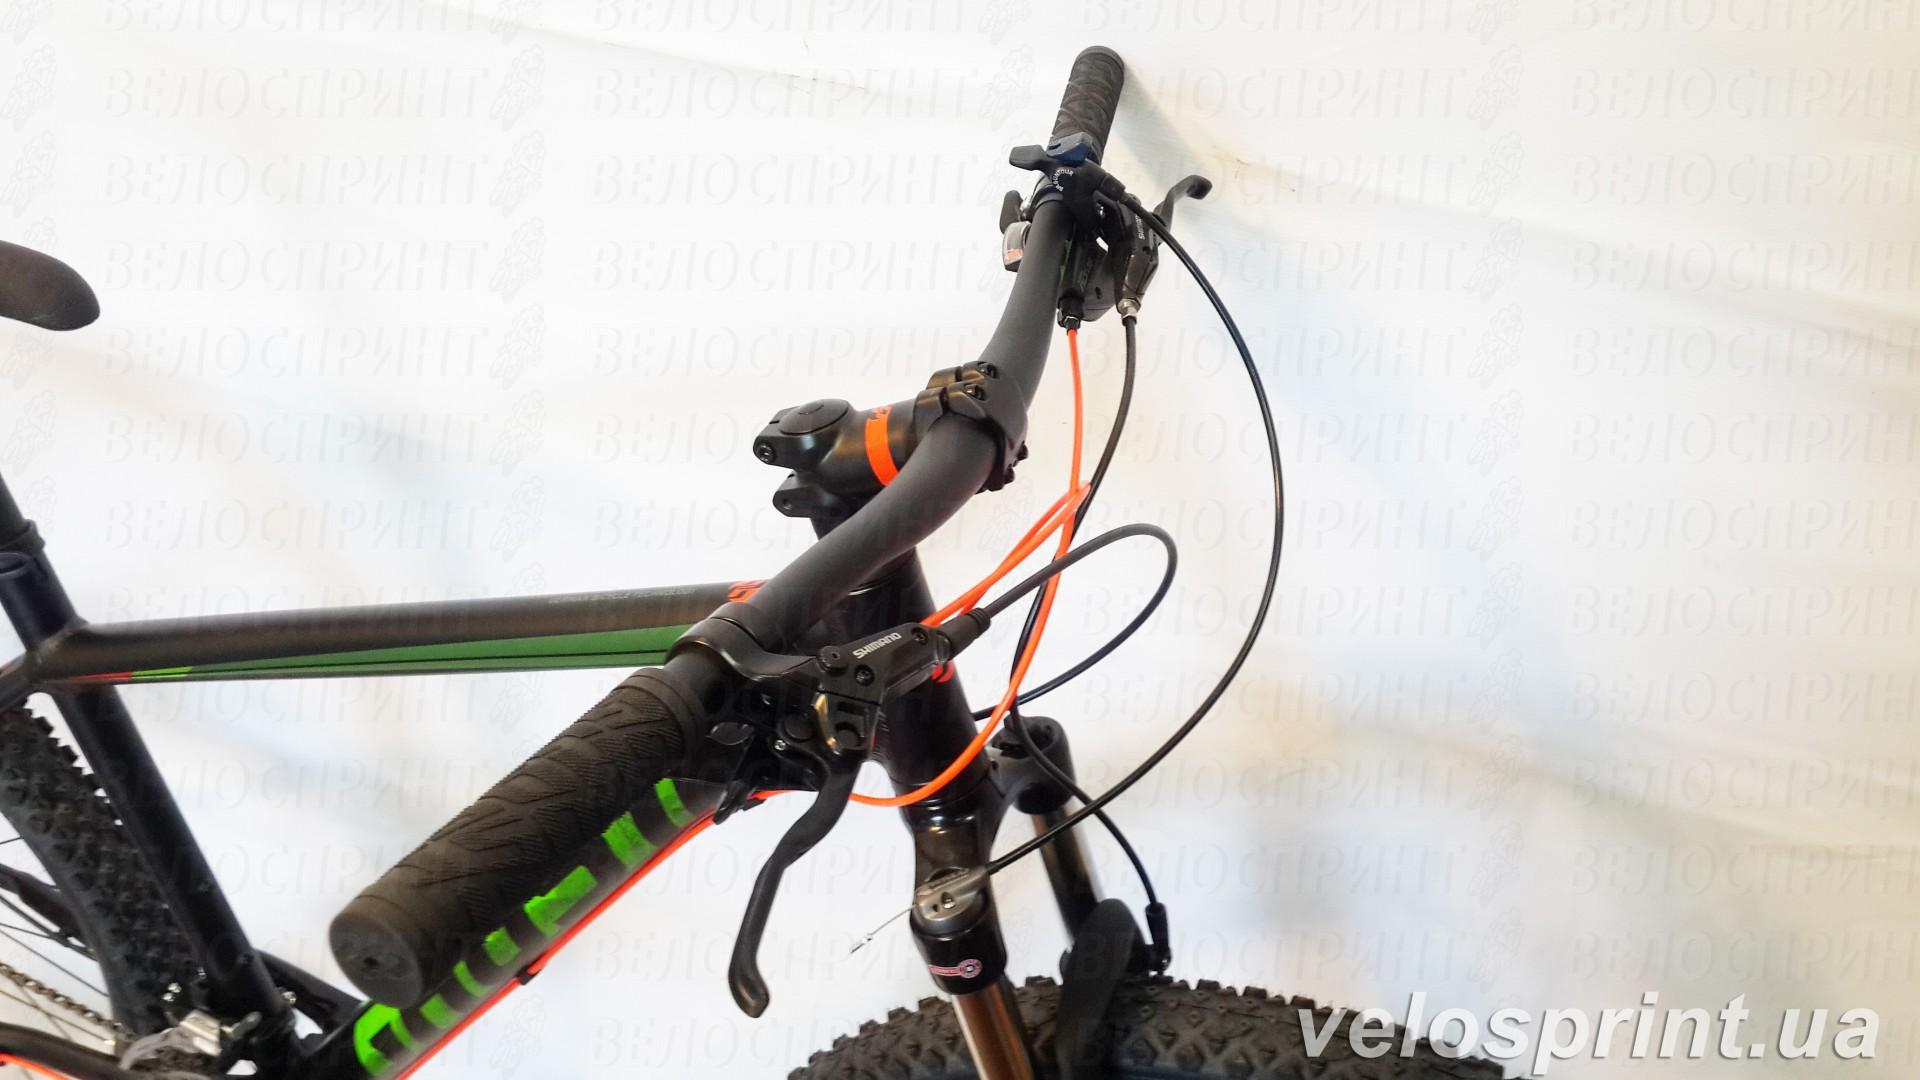 Велосипед GHOST Kato 3 AL 27.5 nightblack/riotgreen/neonred передний тормоз тормозные ручки год 2017